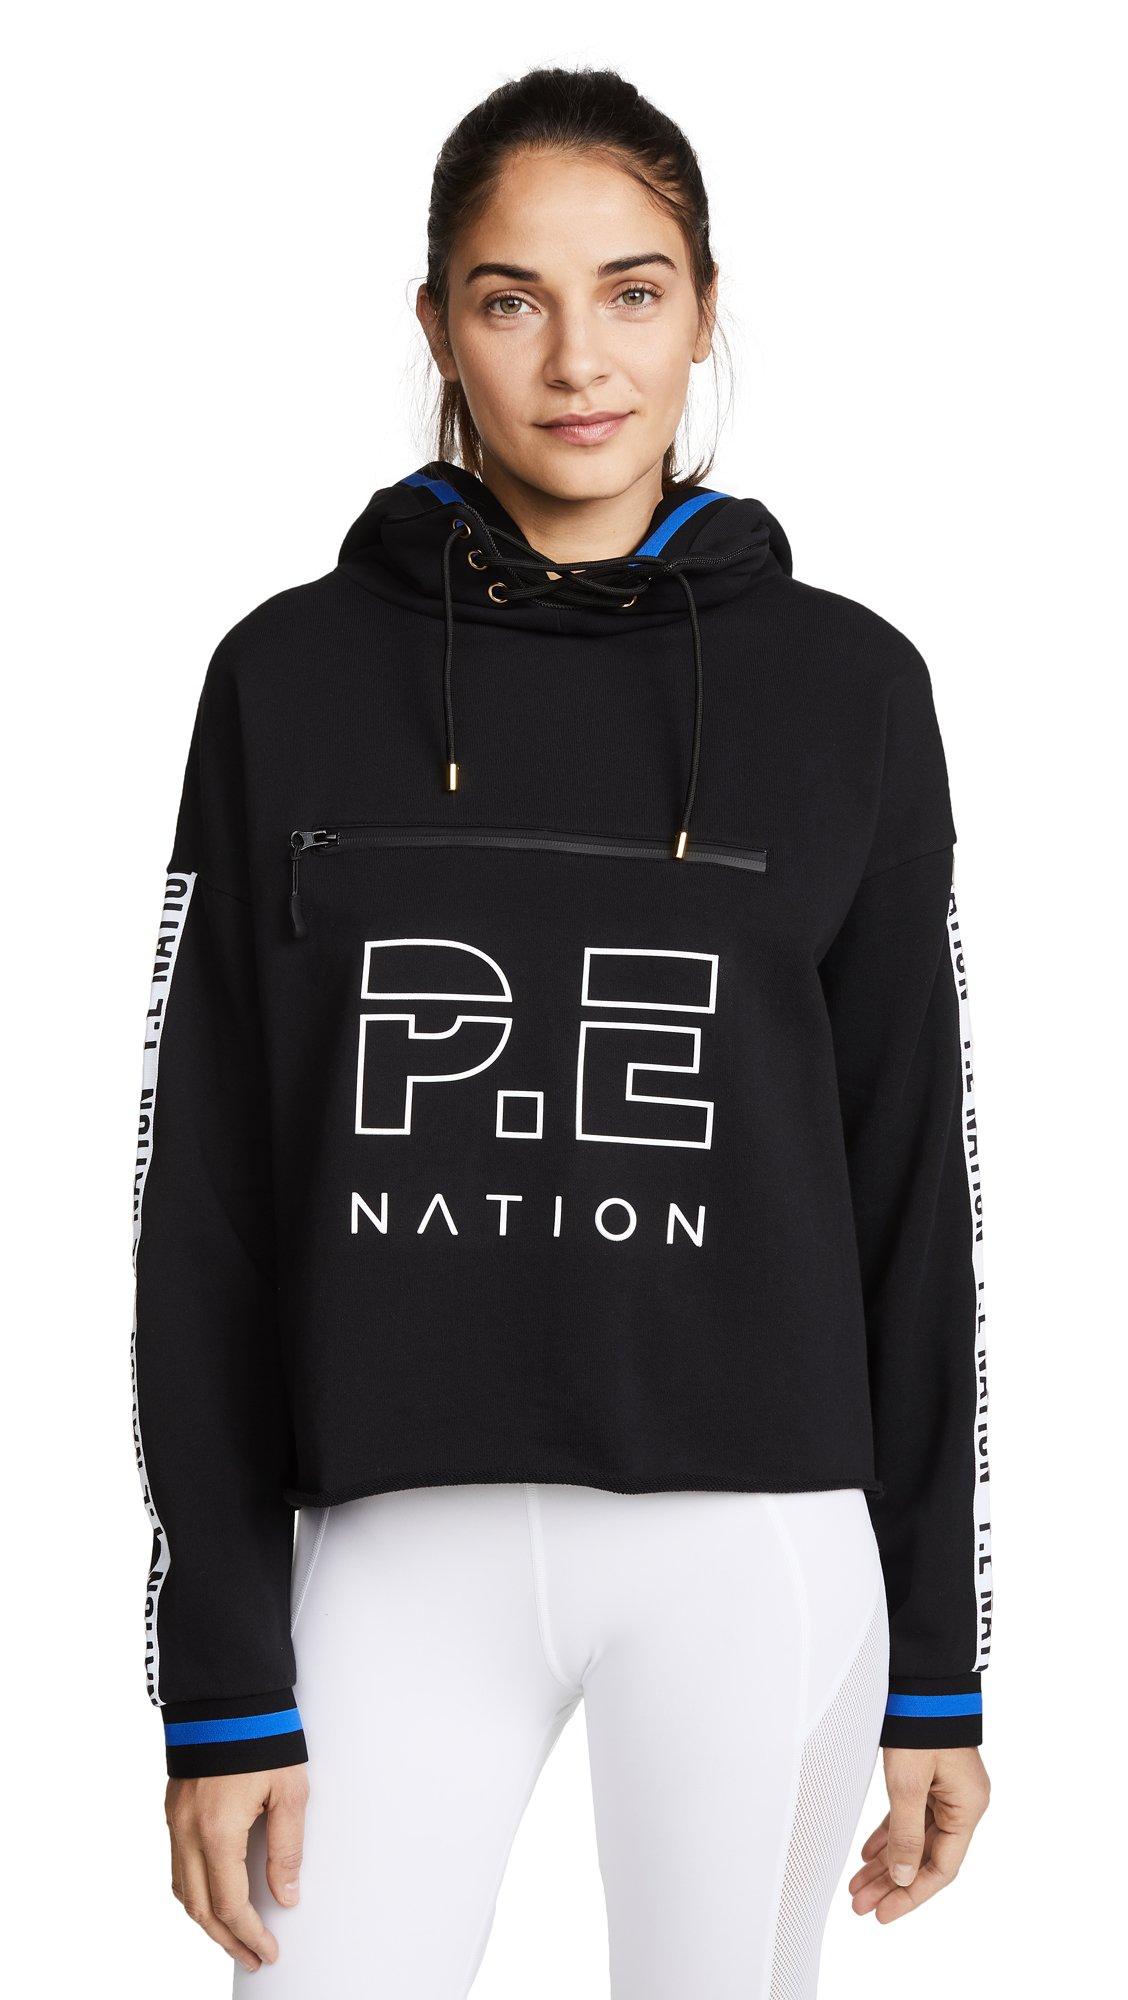 P.E NATION Women's Blind Pass Hoodie Top, Black, Medium